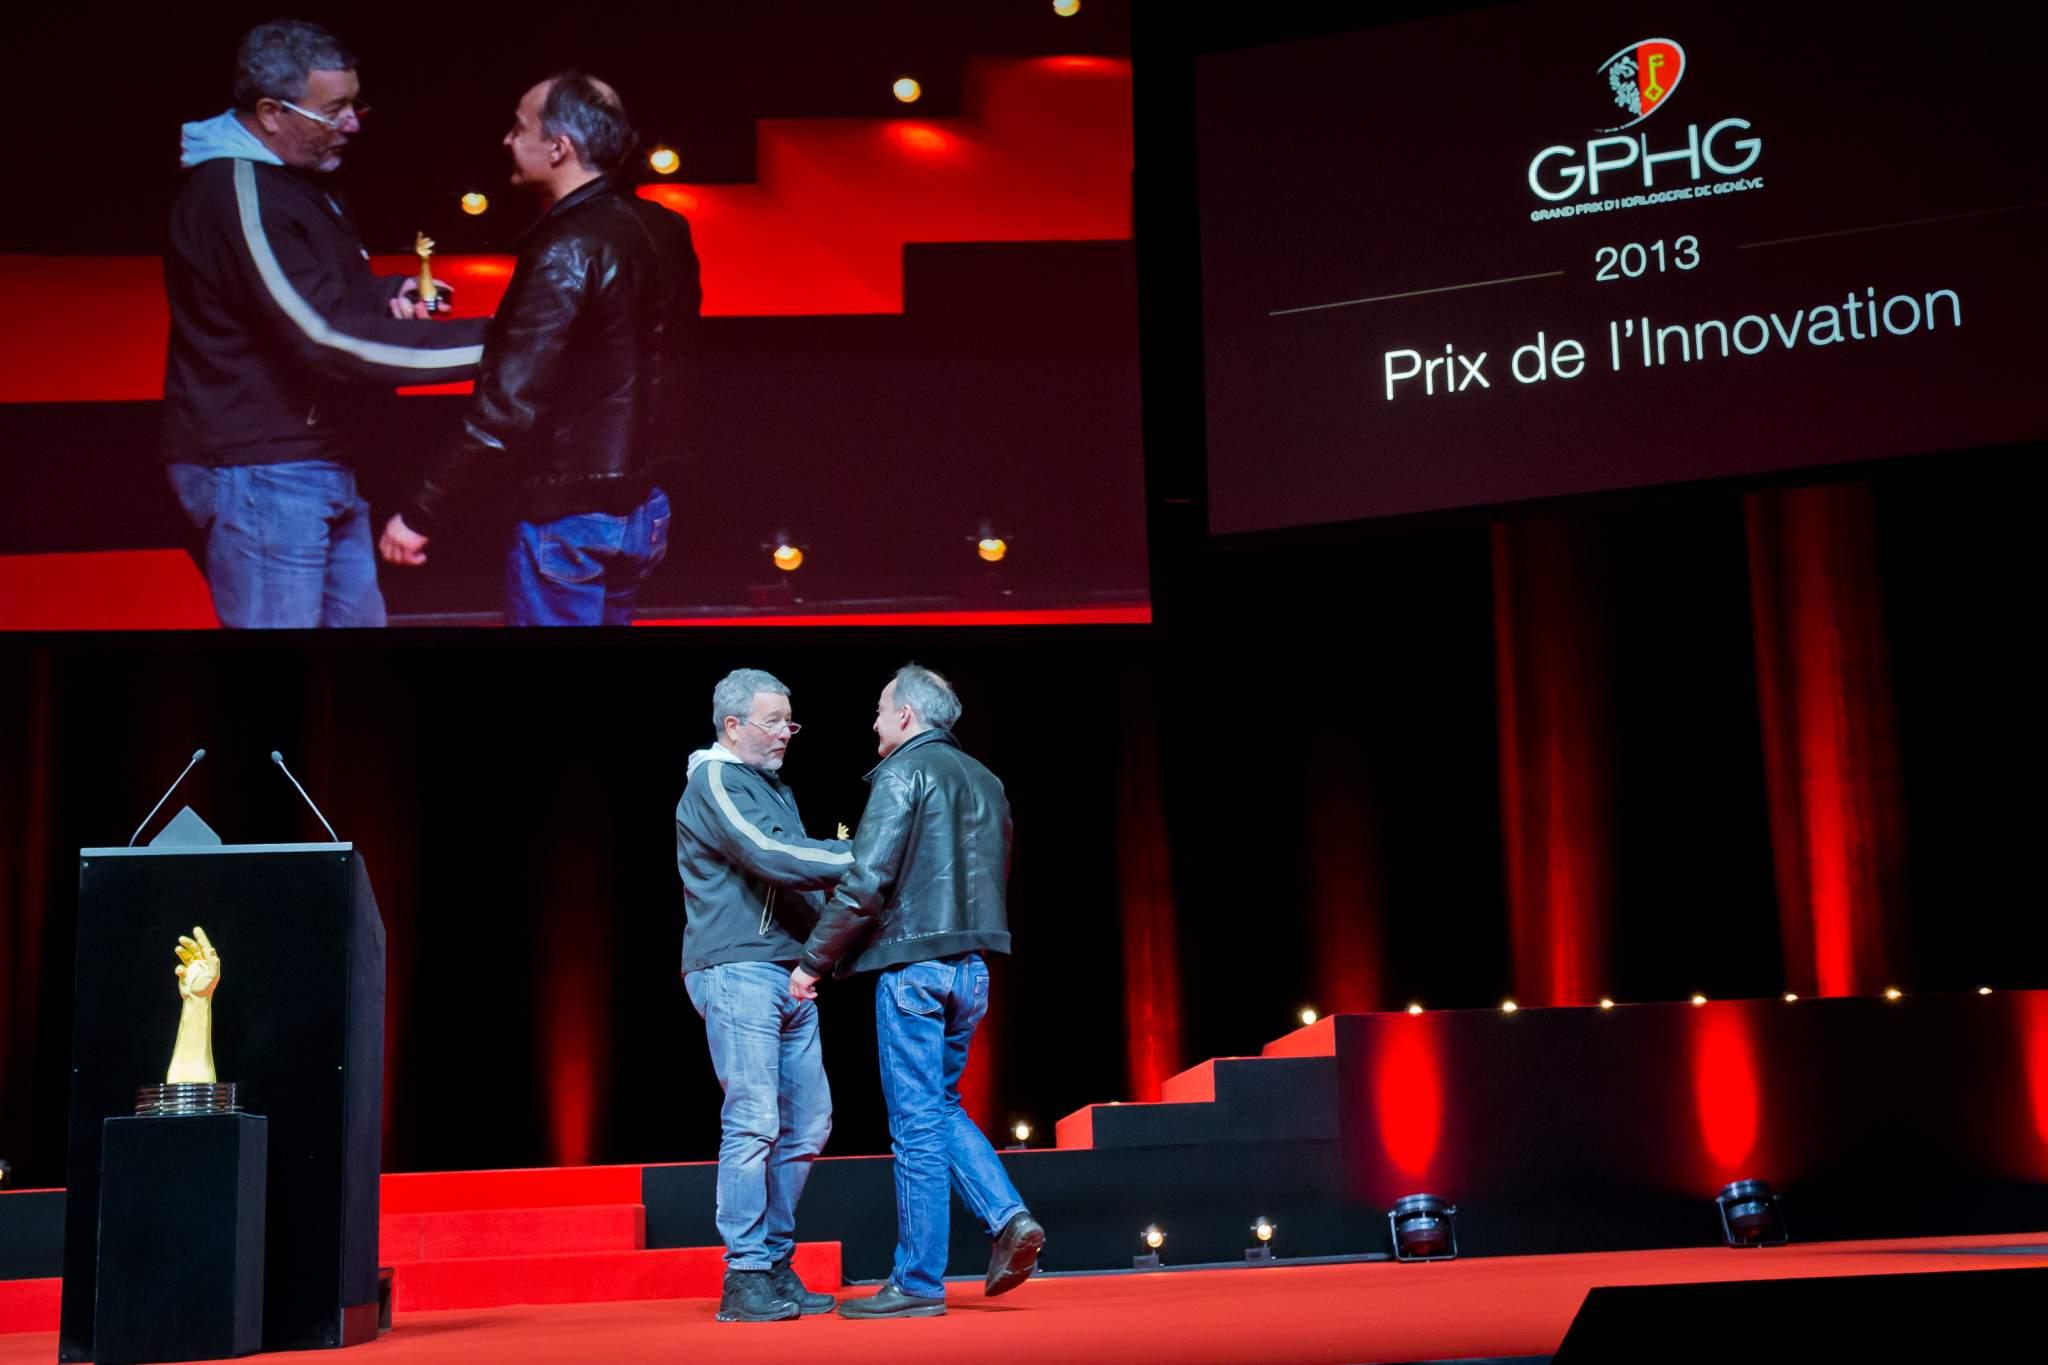 Philippe Starck, member of the Jury 2013, and Vianney Halter